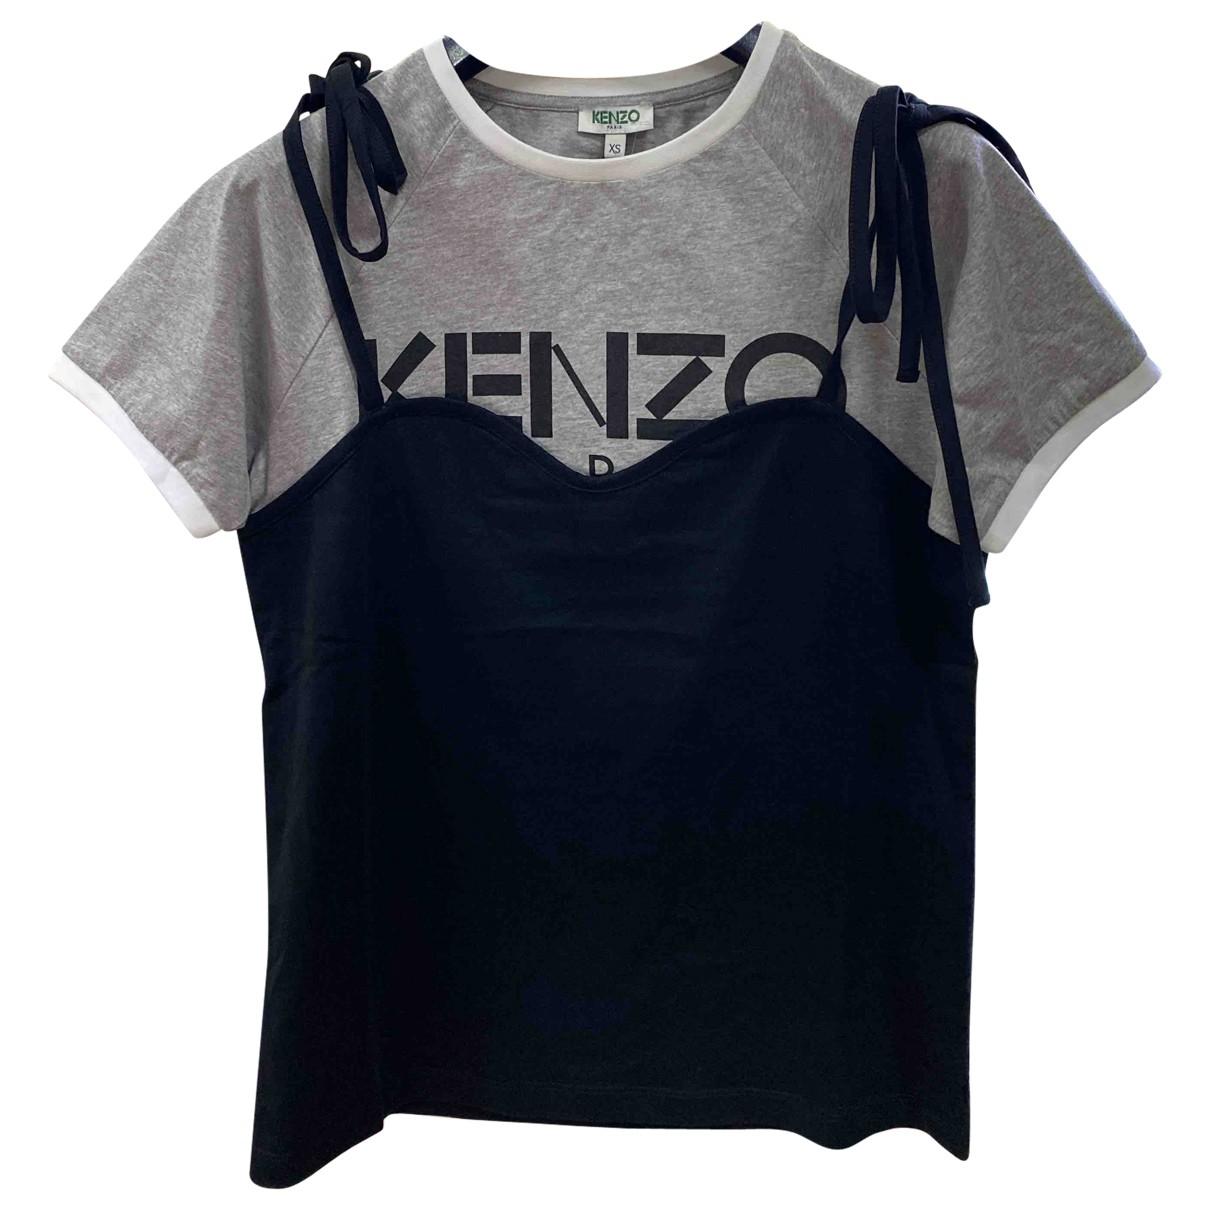 Kenzo \N Black Cotton  top for Women XS International